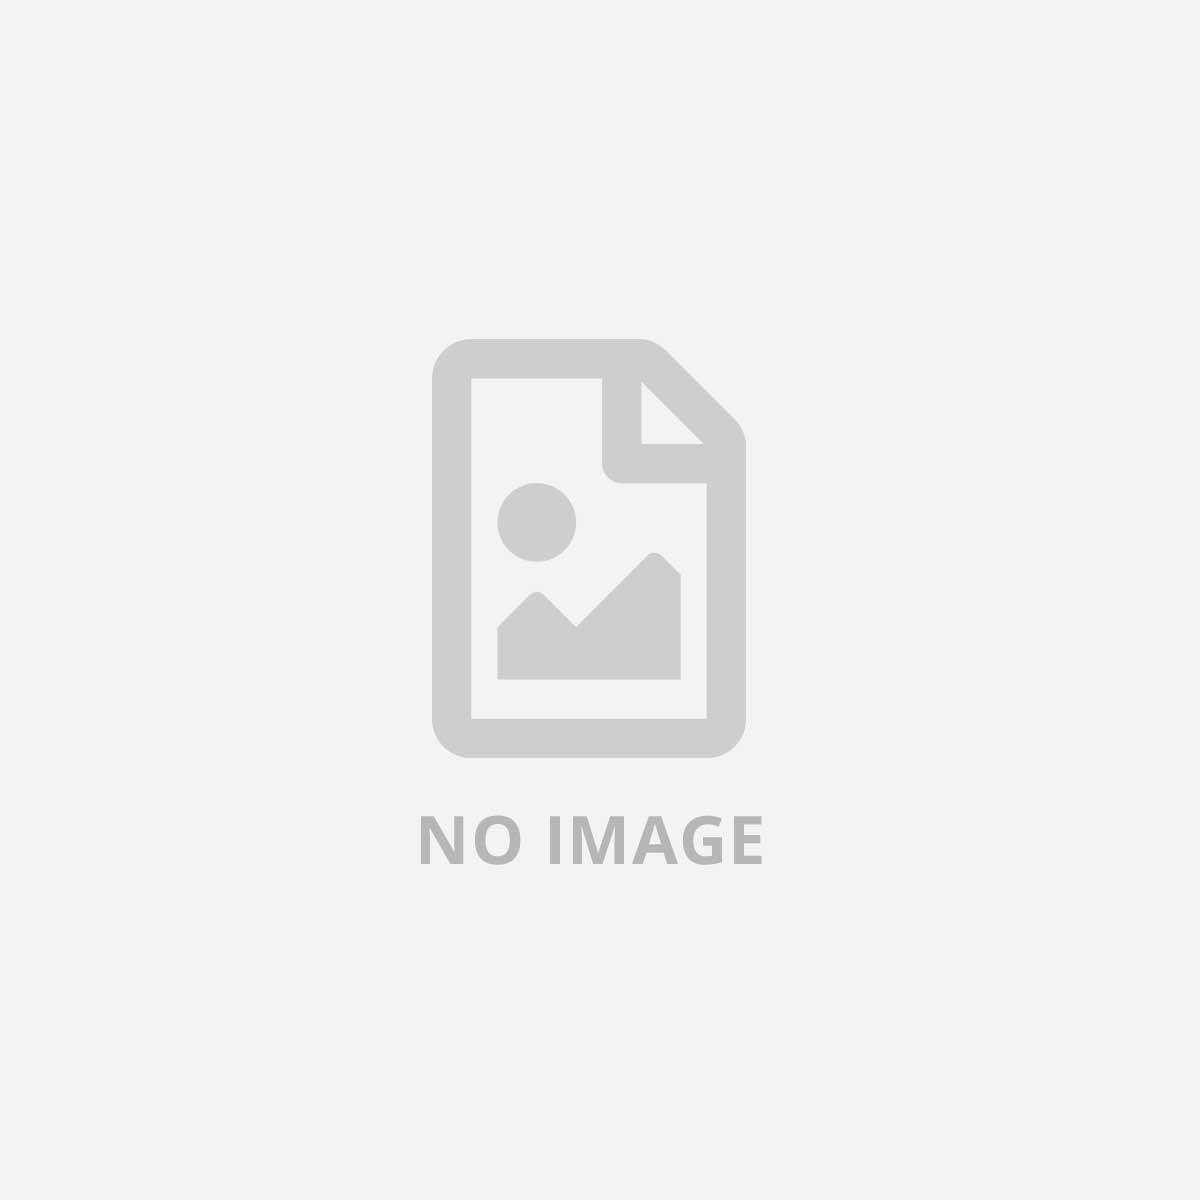 AMD 8-SERIES 3100MHZ 4 CORE